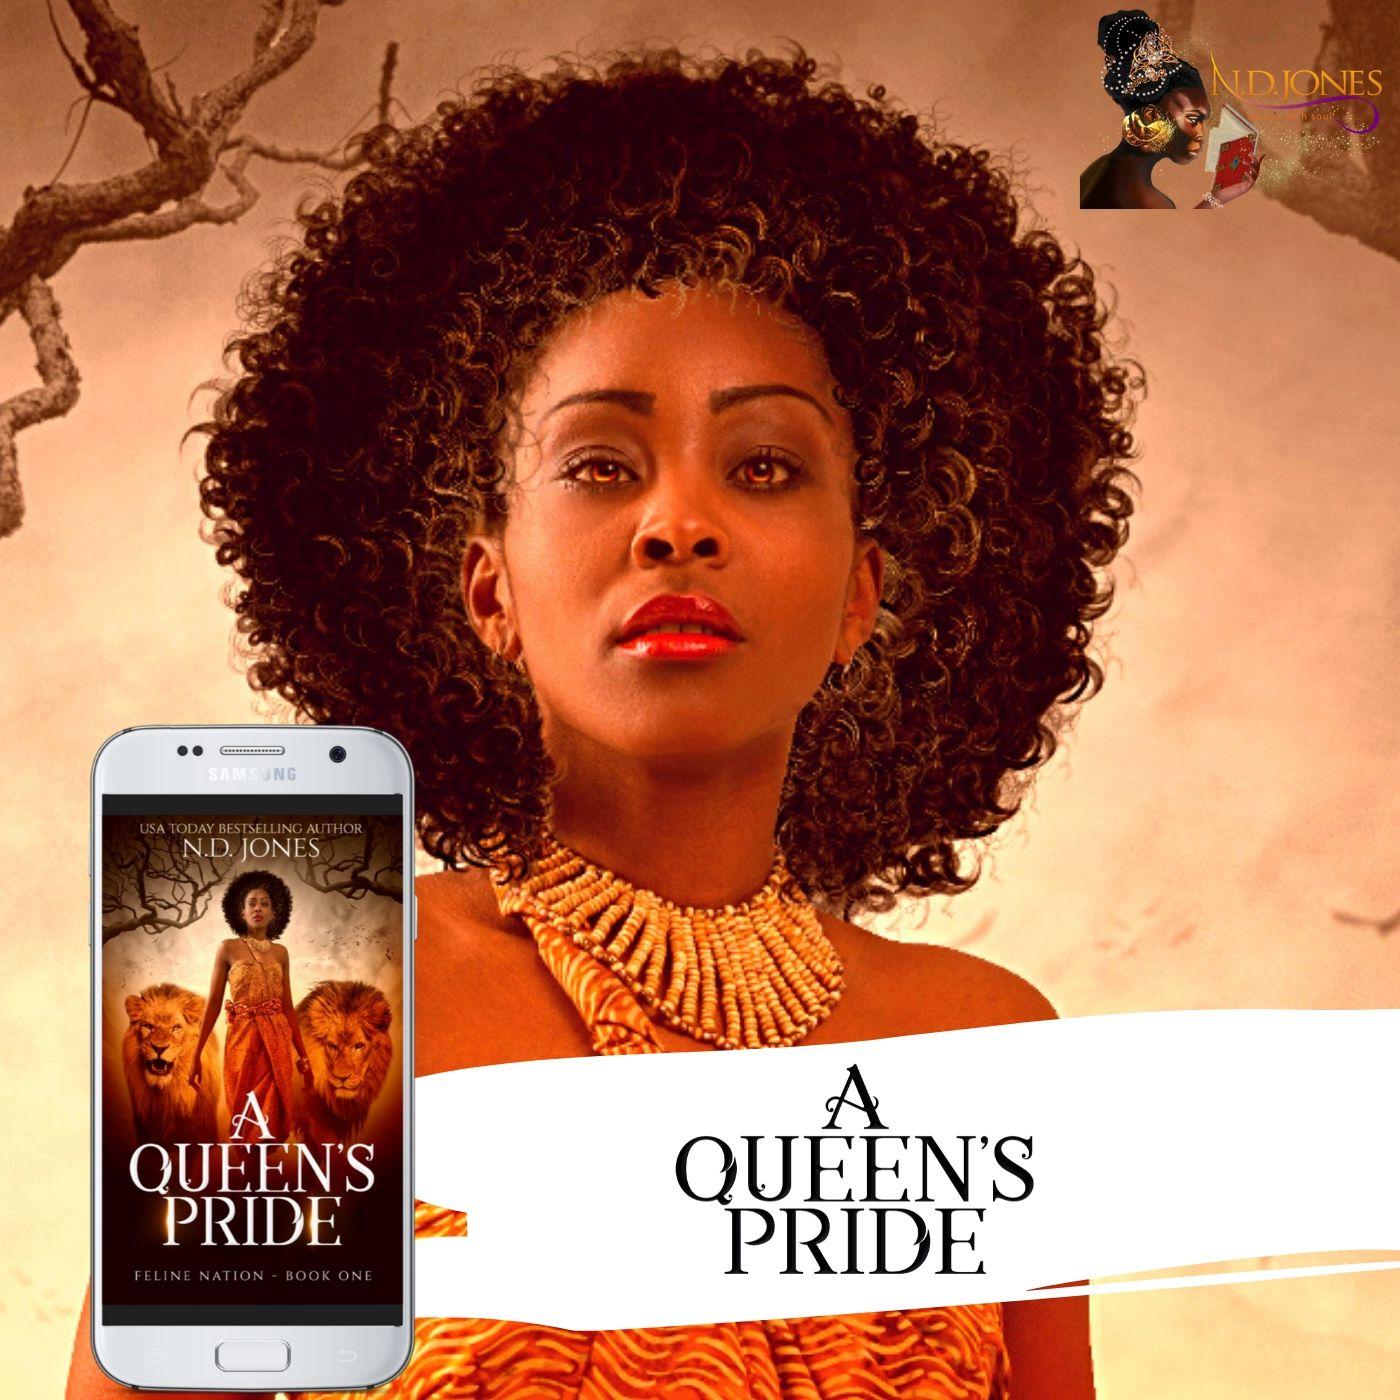 A Queeen's Pride Urban Fantasy Playlist by ND Jones